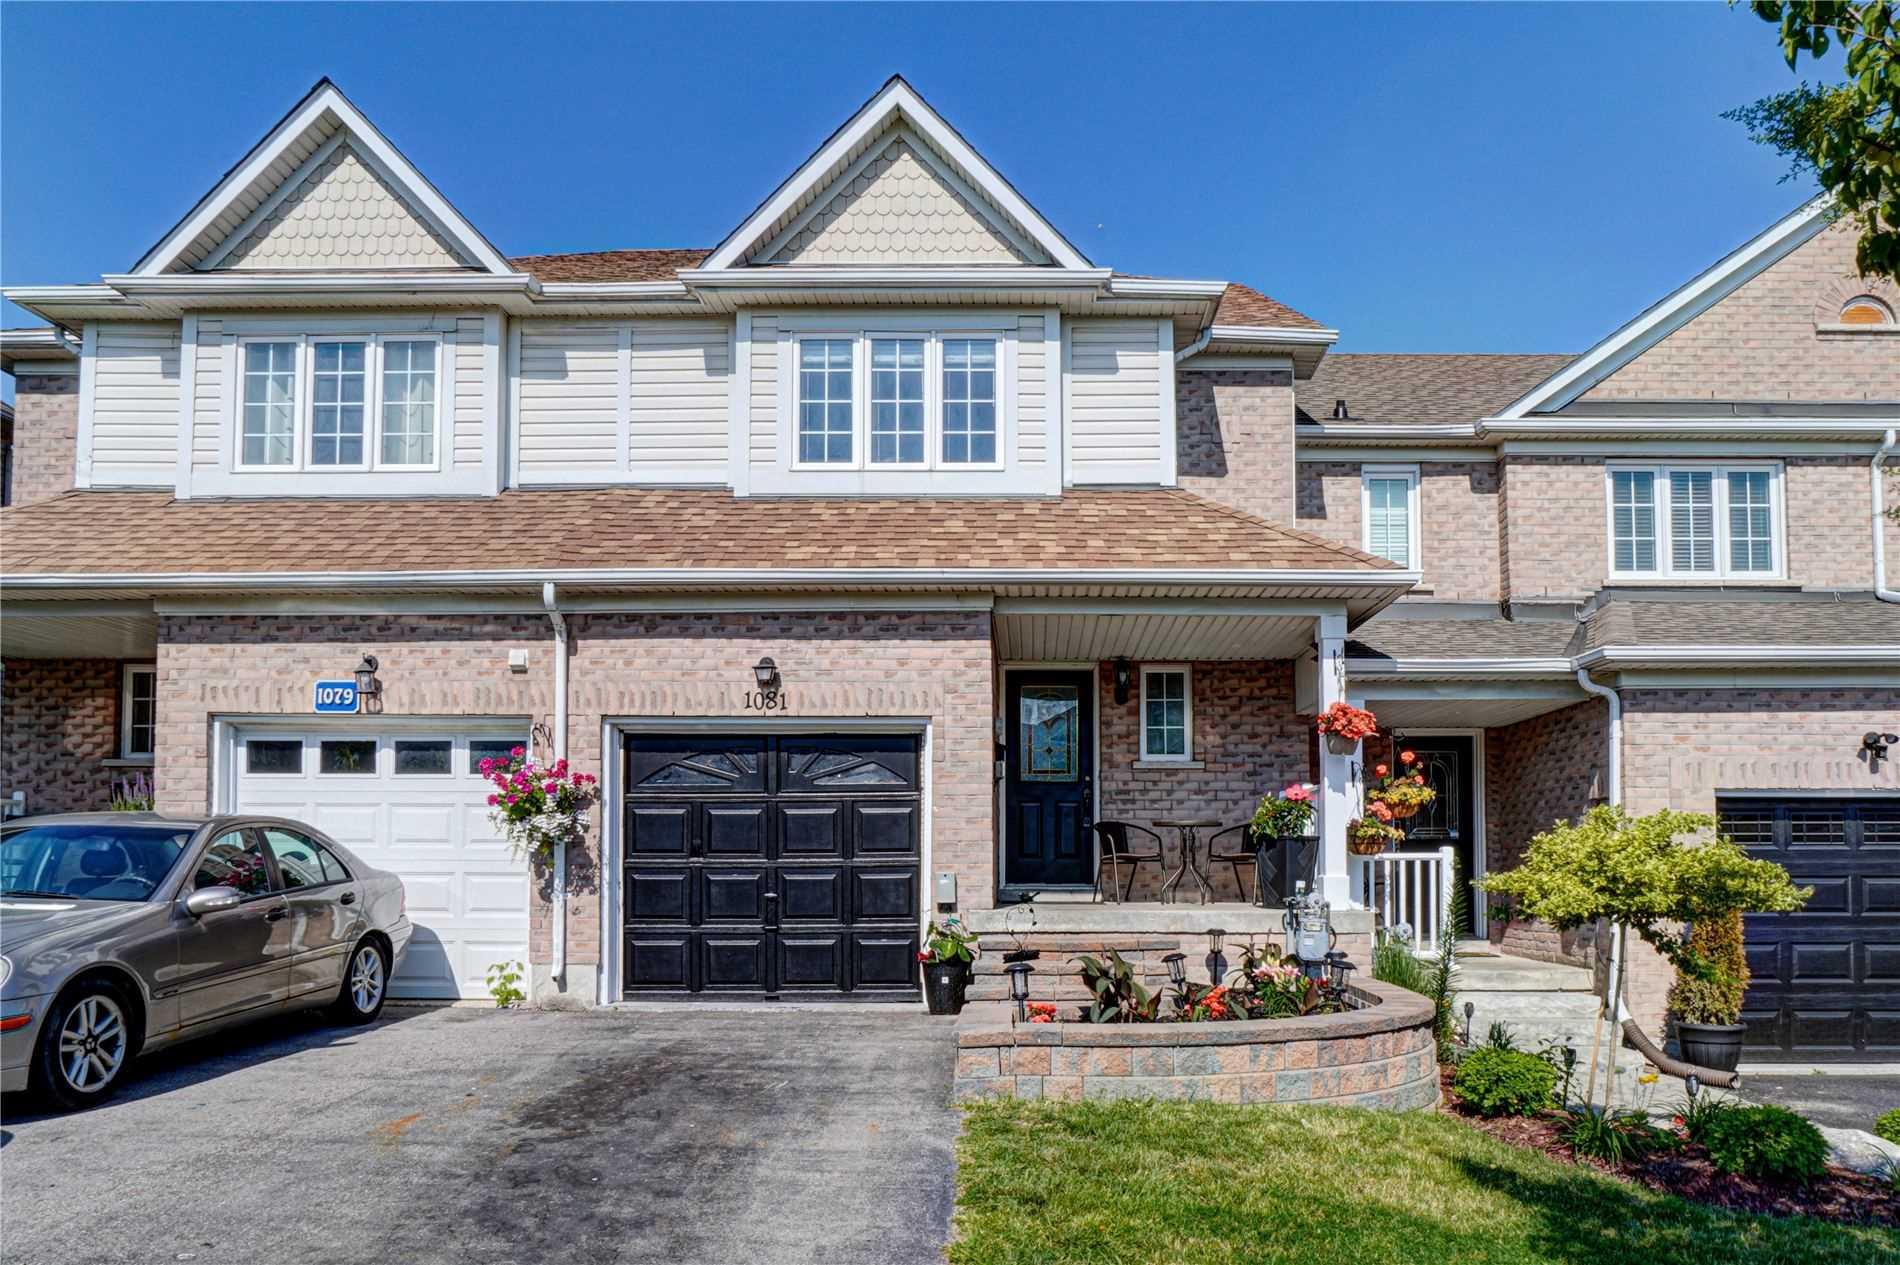 1081 Tilbury St, Oshawa, Ontario L1H8V8, 3 Bedrooms Bedrooms, ,2 BathroomsBathrooms,Att/row/twnhouse,For Sale,Tilbury,E5272333